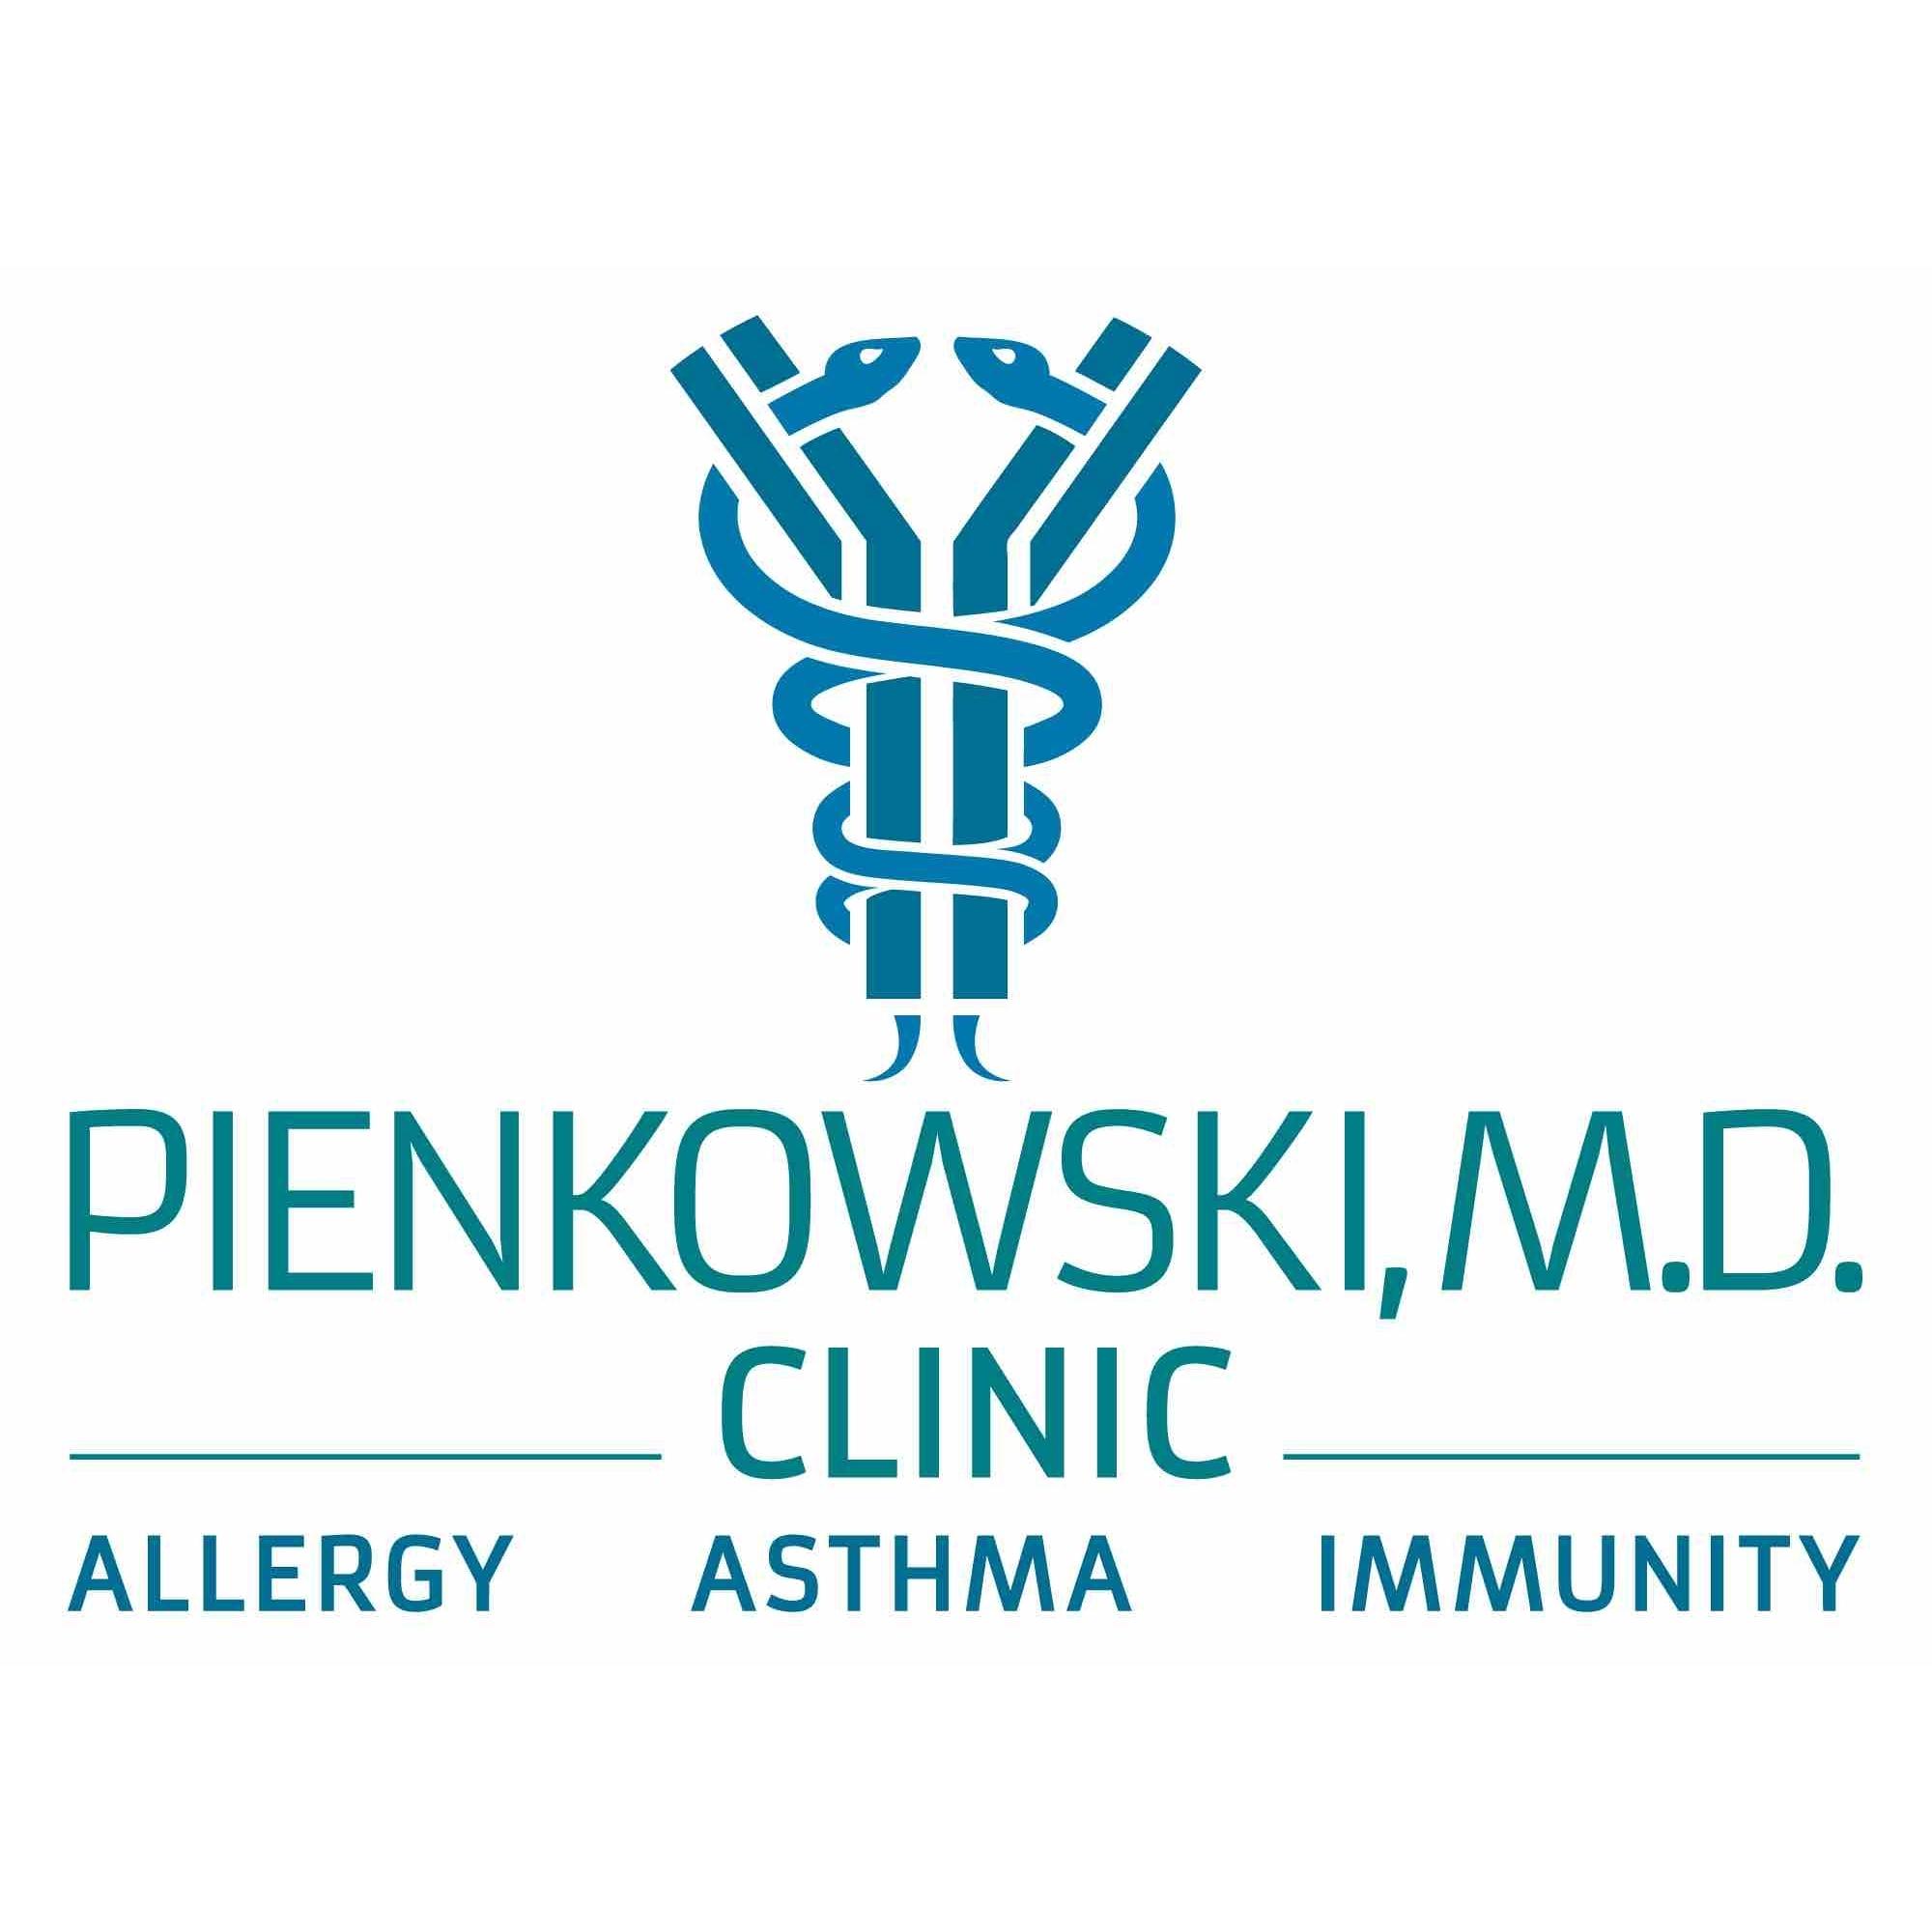 Pienkowski, MD Clinic - Allergy Asthma Immunity - Knoxville, TN - Allergy & Immunology